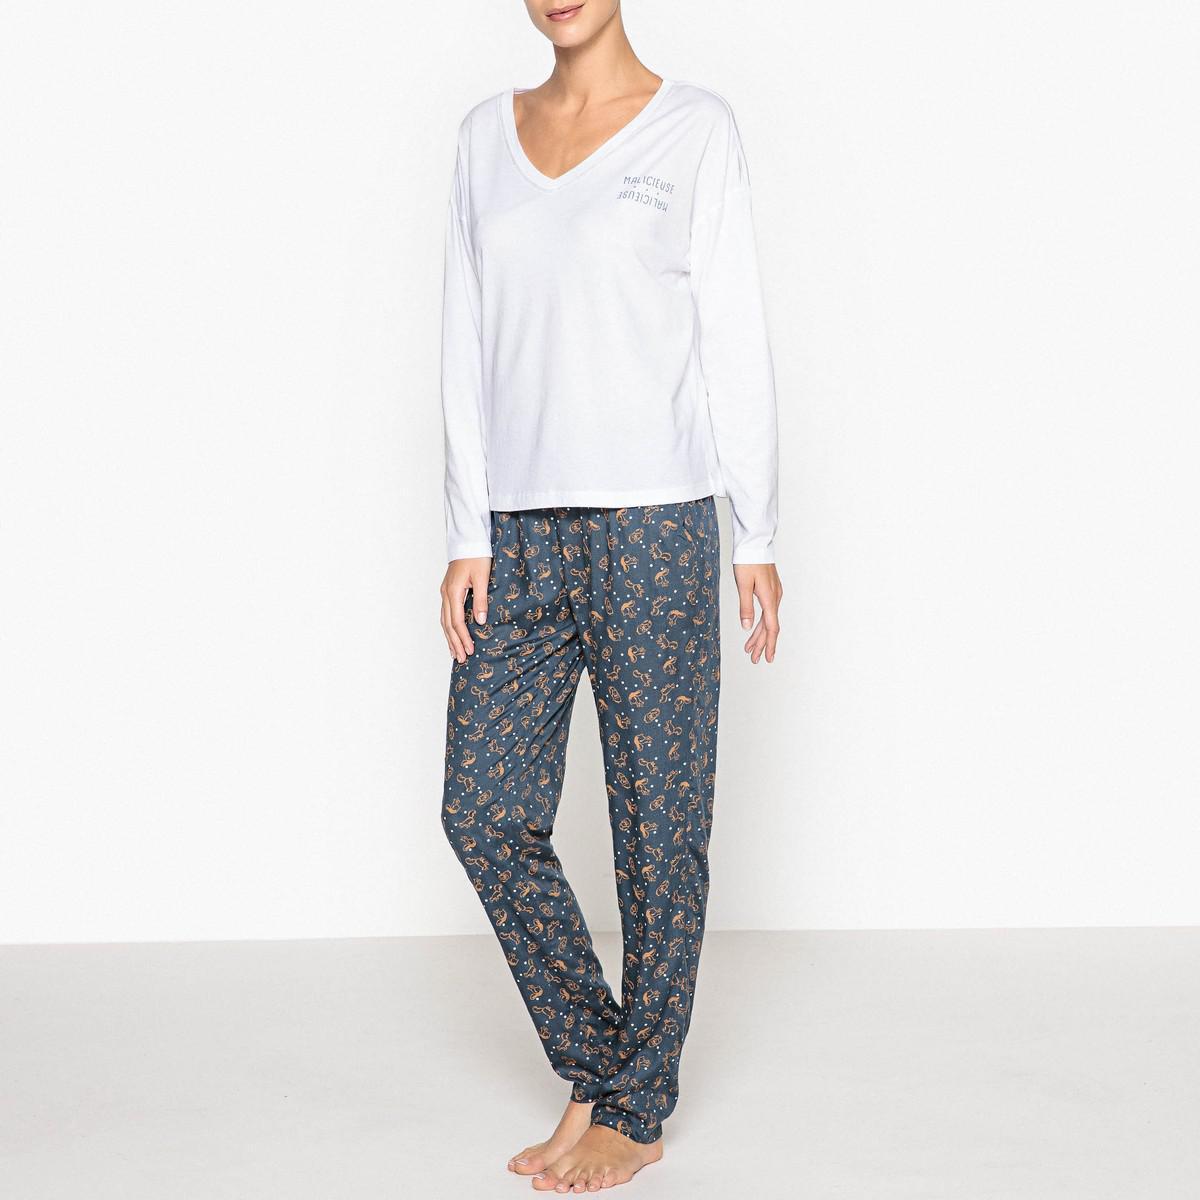 3eb708788f Lyst - La Redoute Printed Pyjamas in Blue